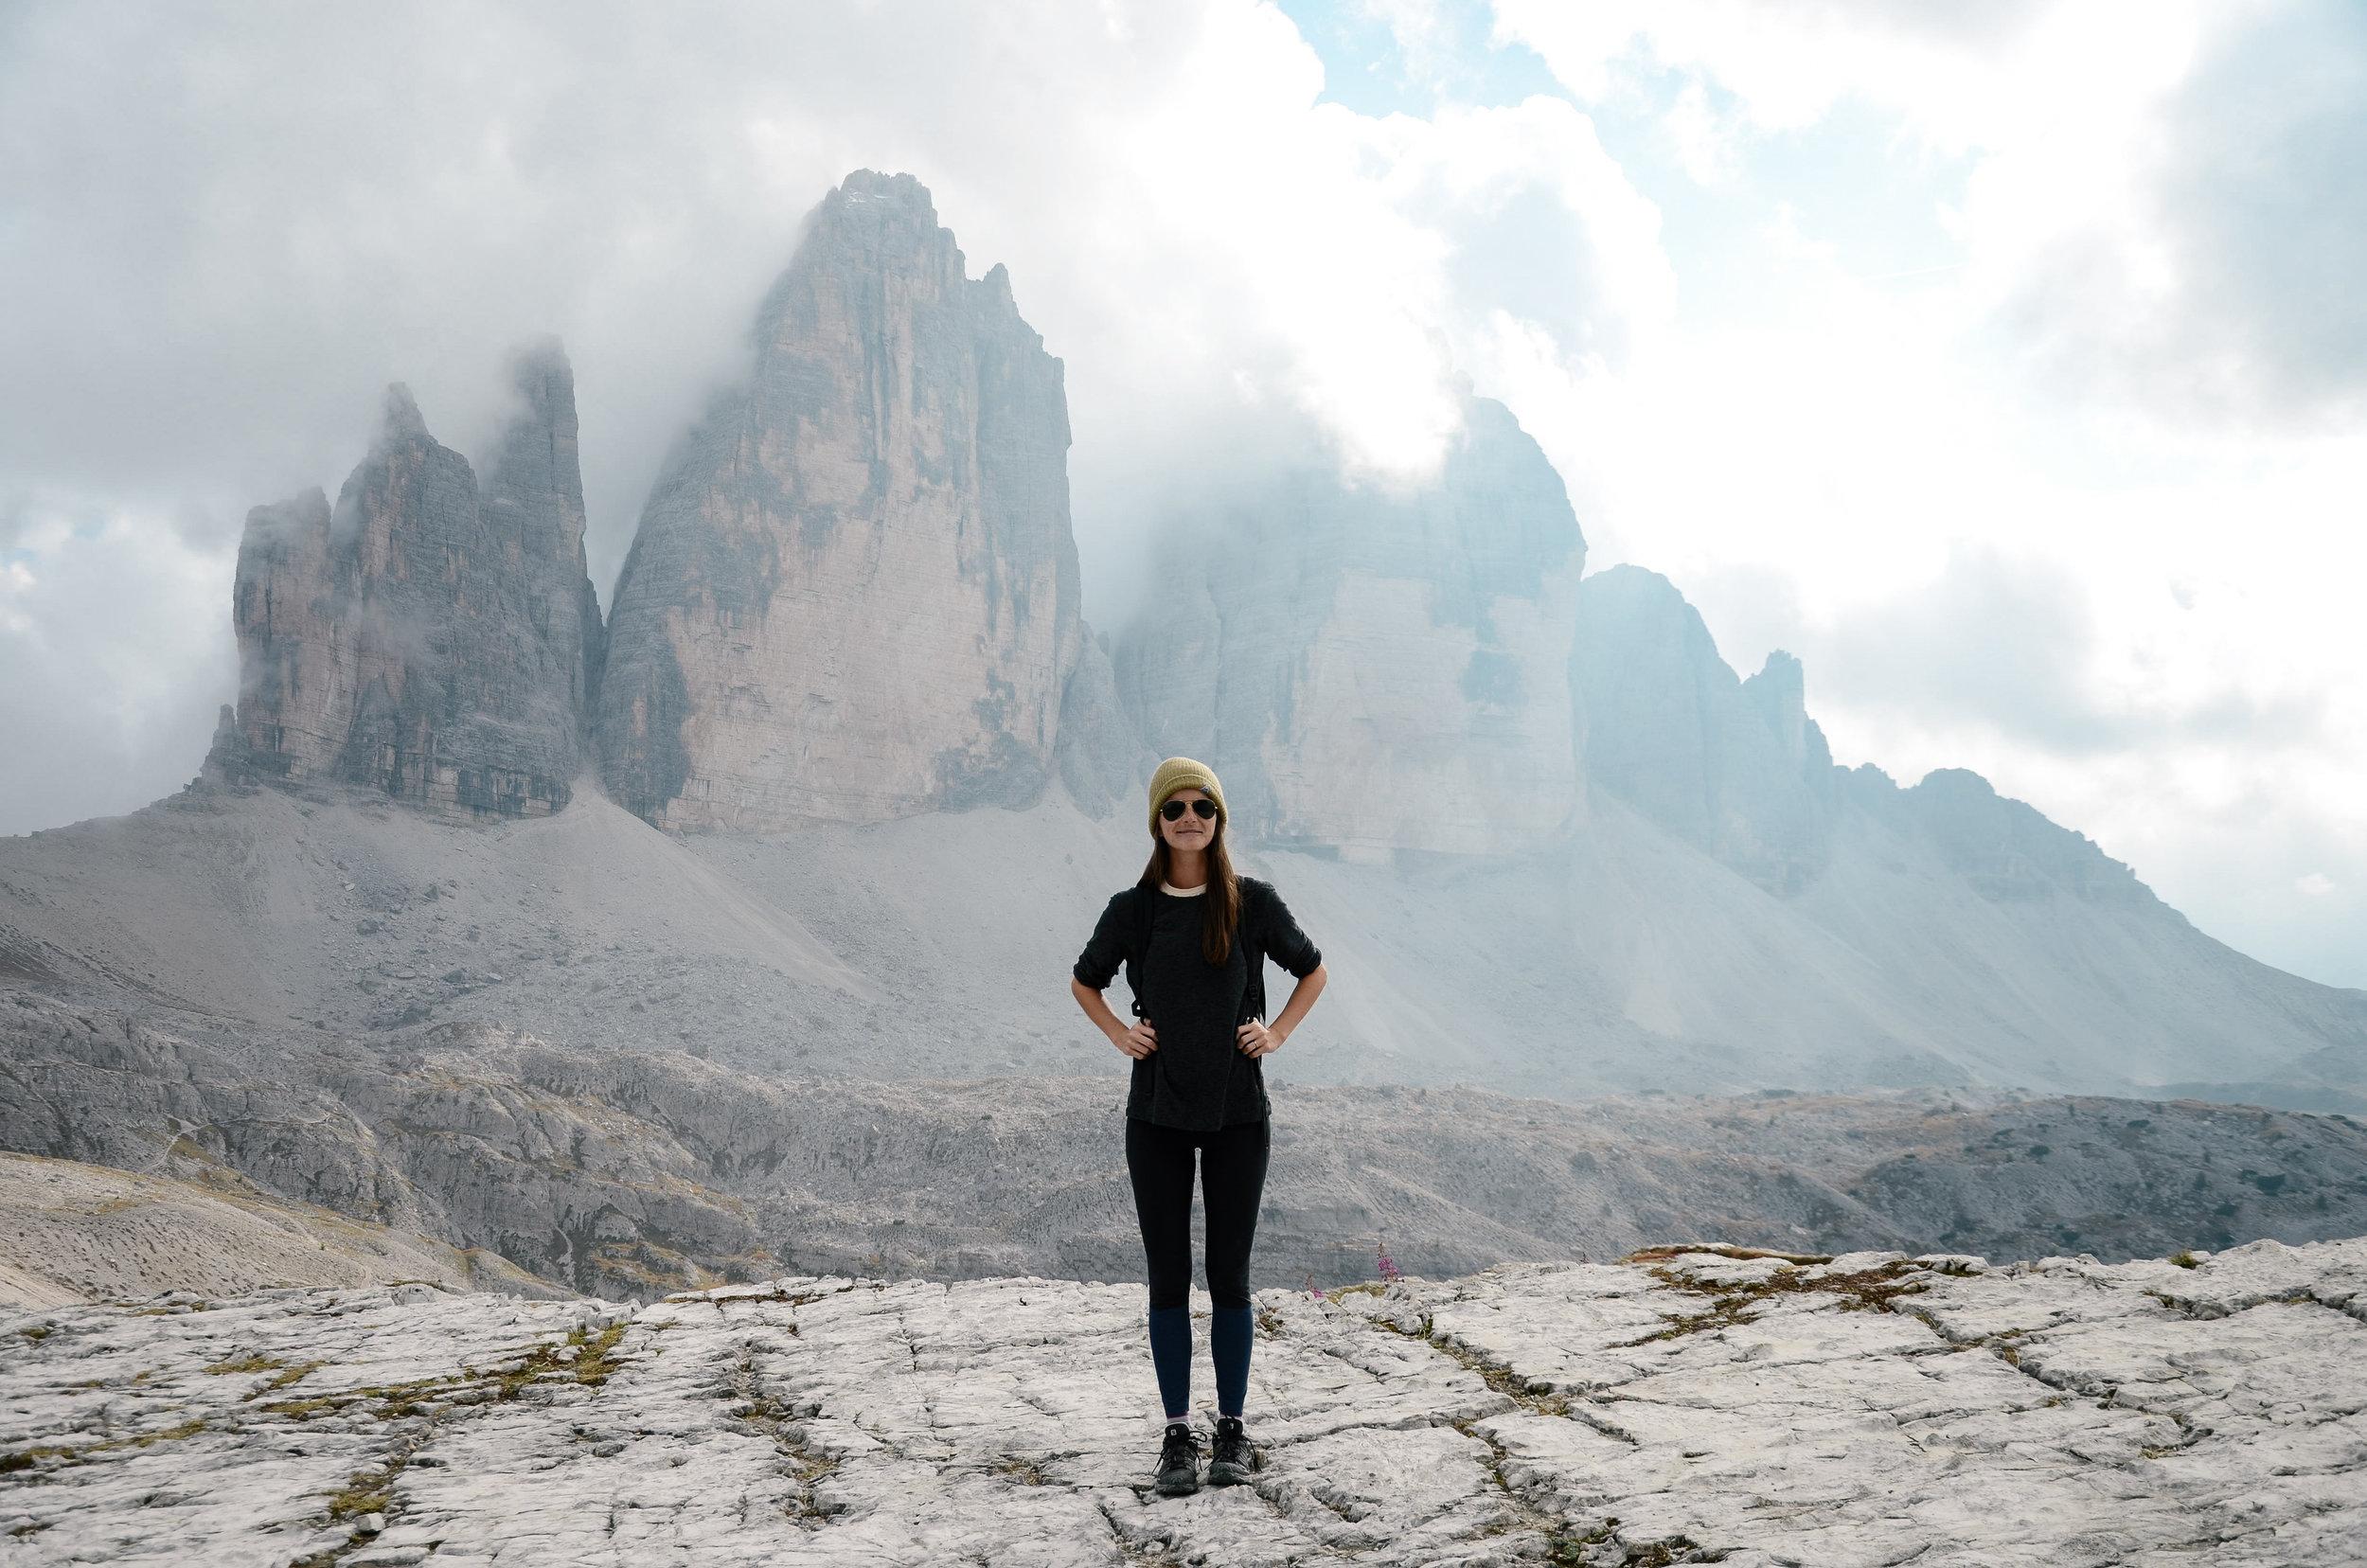 adventure-in-italy-3-hikes-dolomites-hiking-travel-blog-tyrol-13.jpg